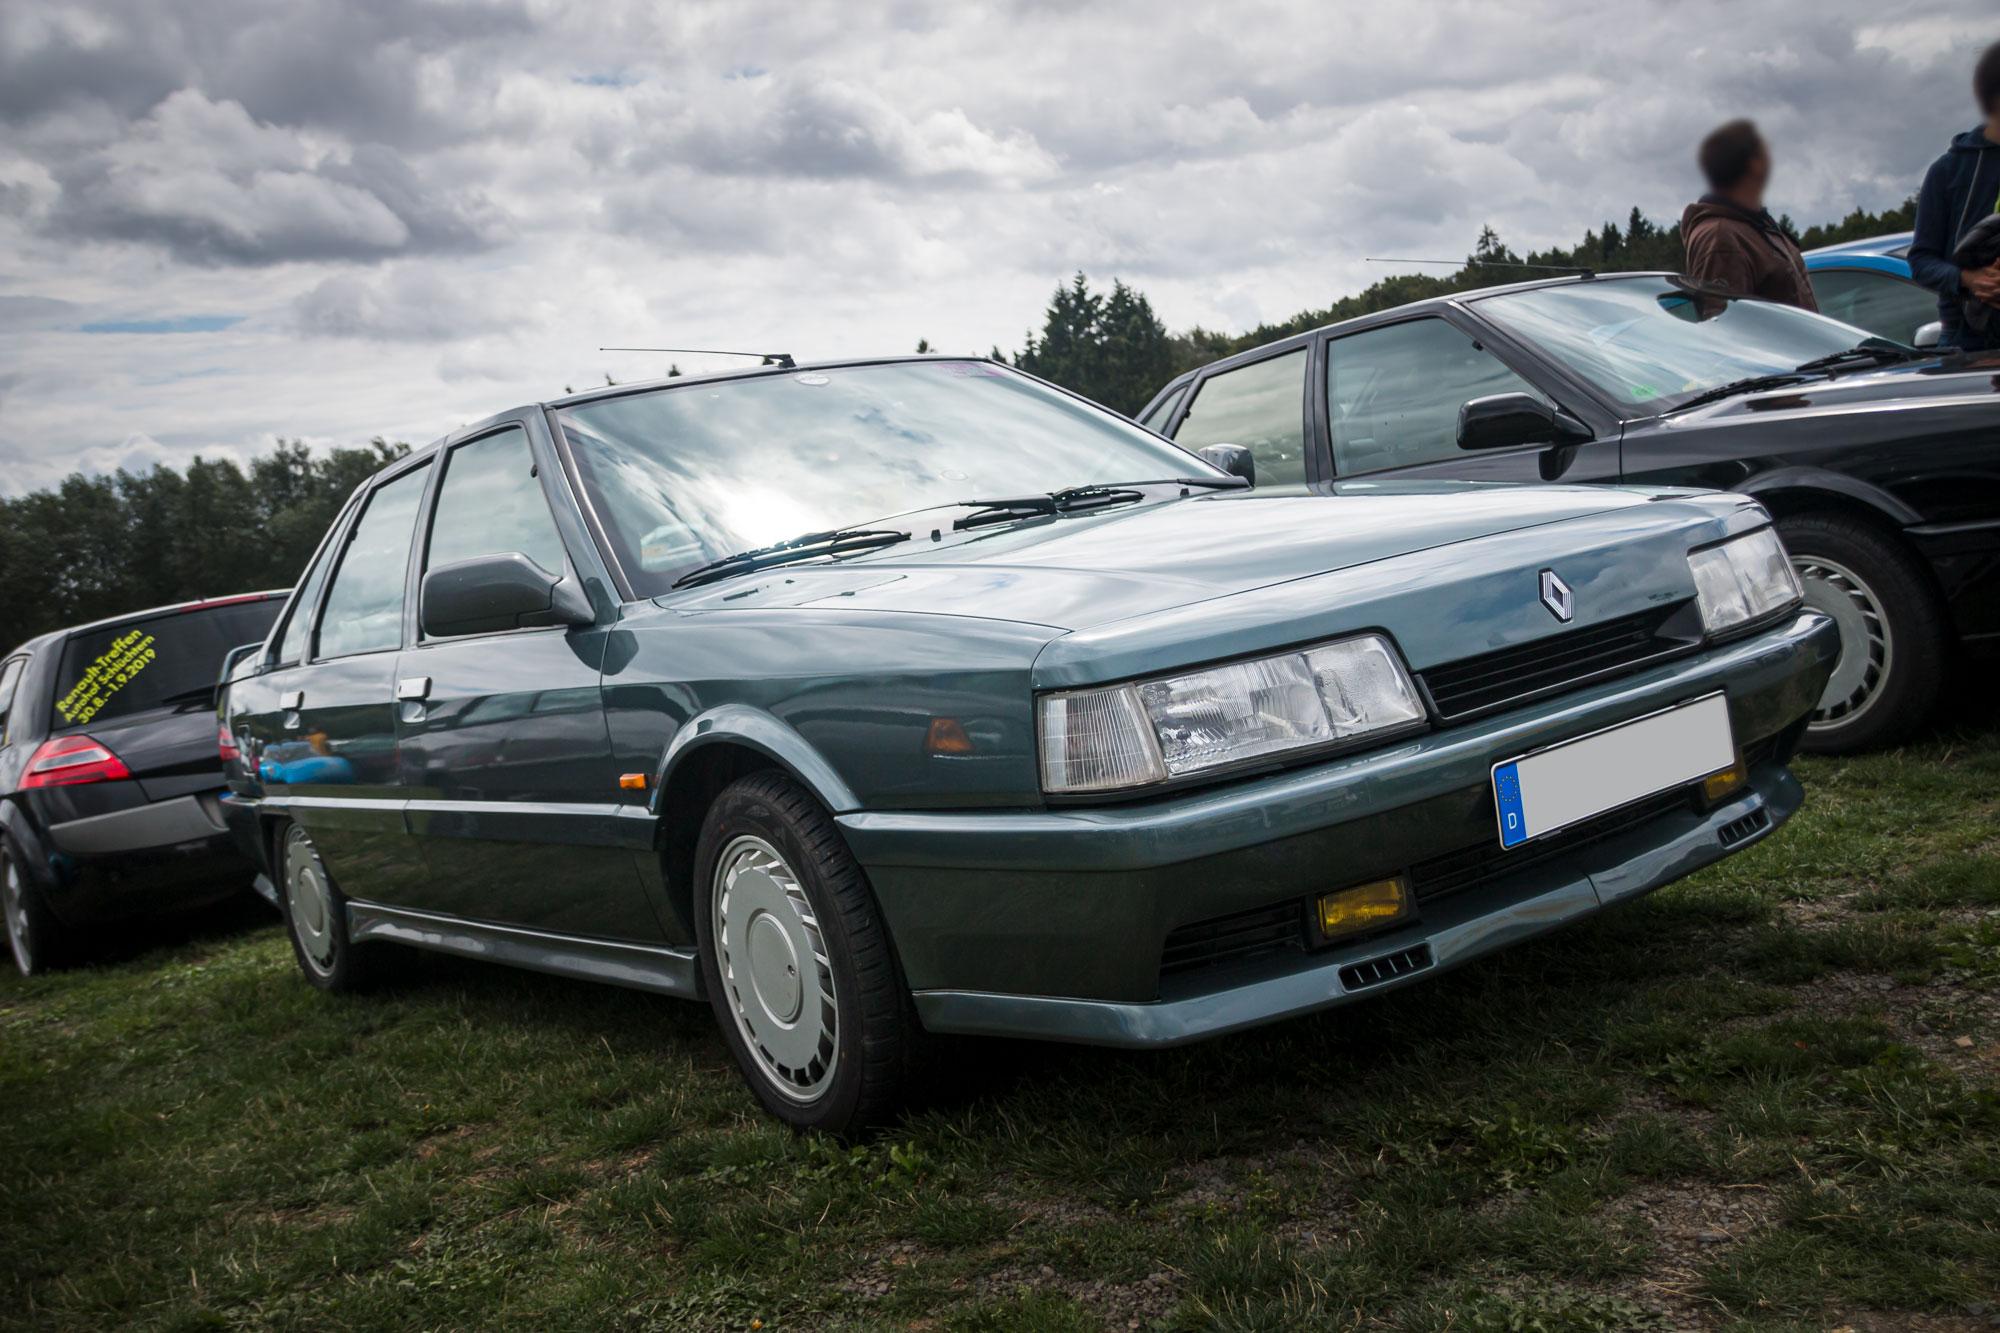 Renault 21 Turbo - D'ARC Sommerfest 2019 am Nürburgring